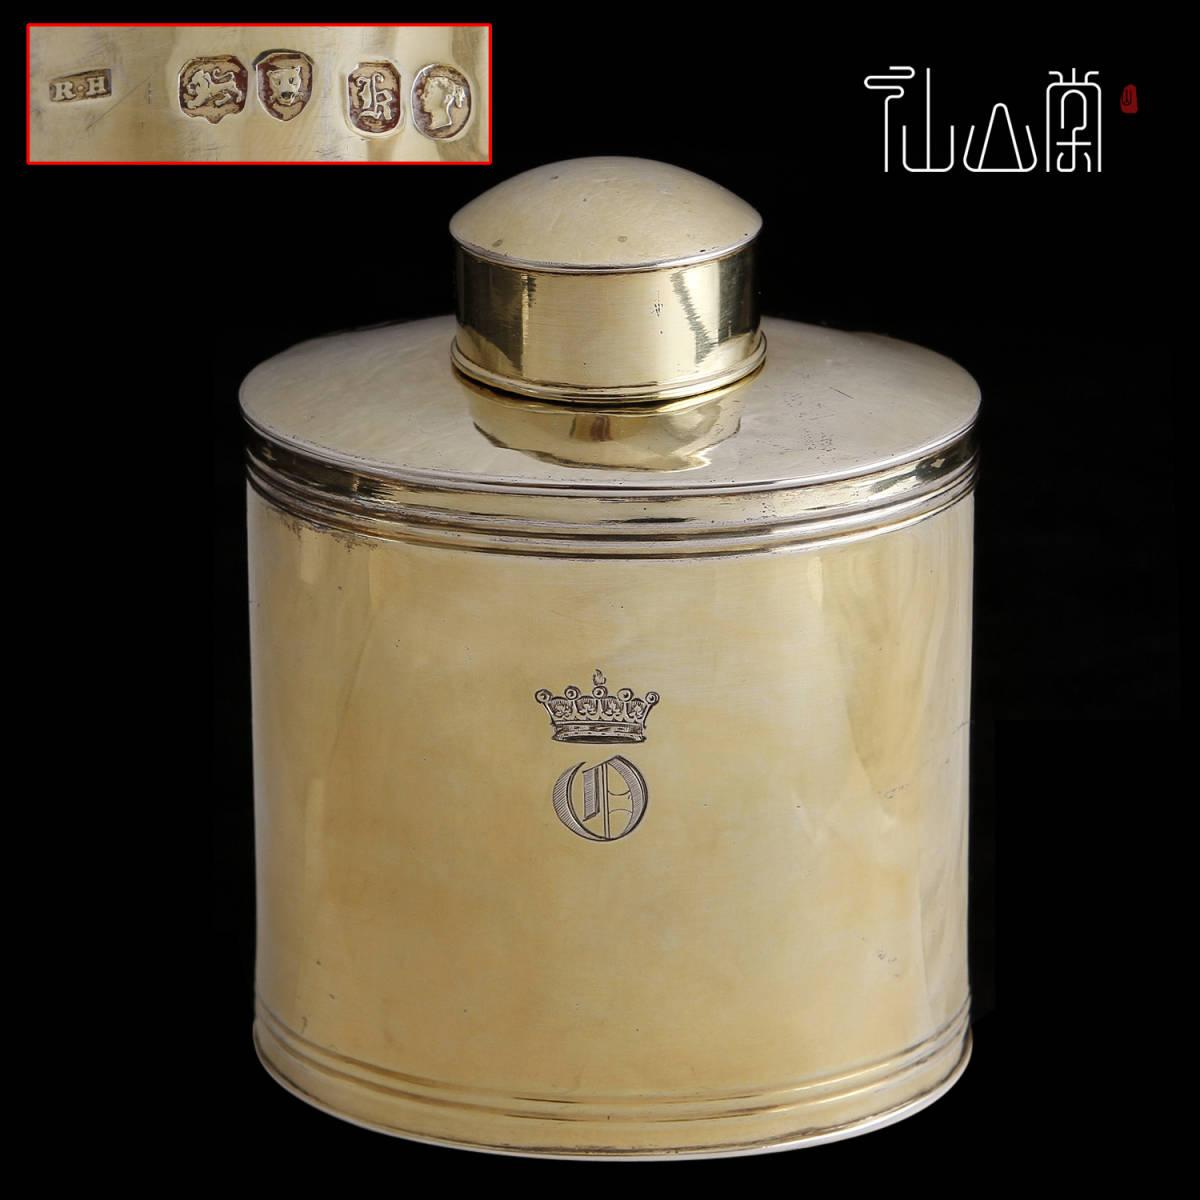 【19W360174】イギリス 1865年 王家の紋章付き 銀鍍金 お茶缶 茶筒 美品 置物拍卖